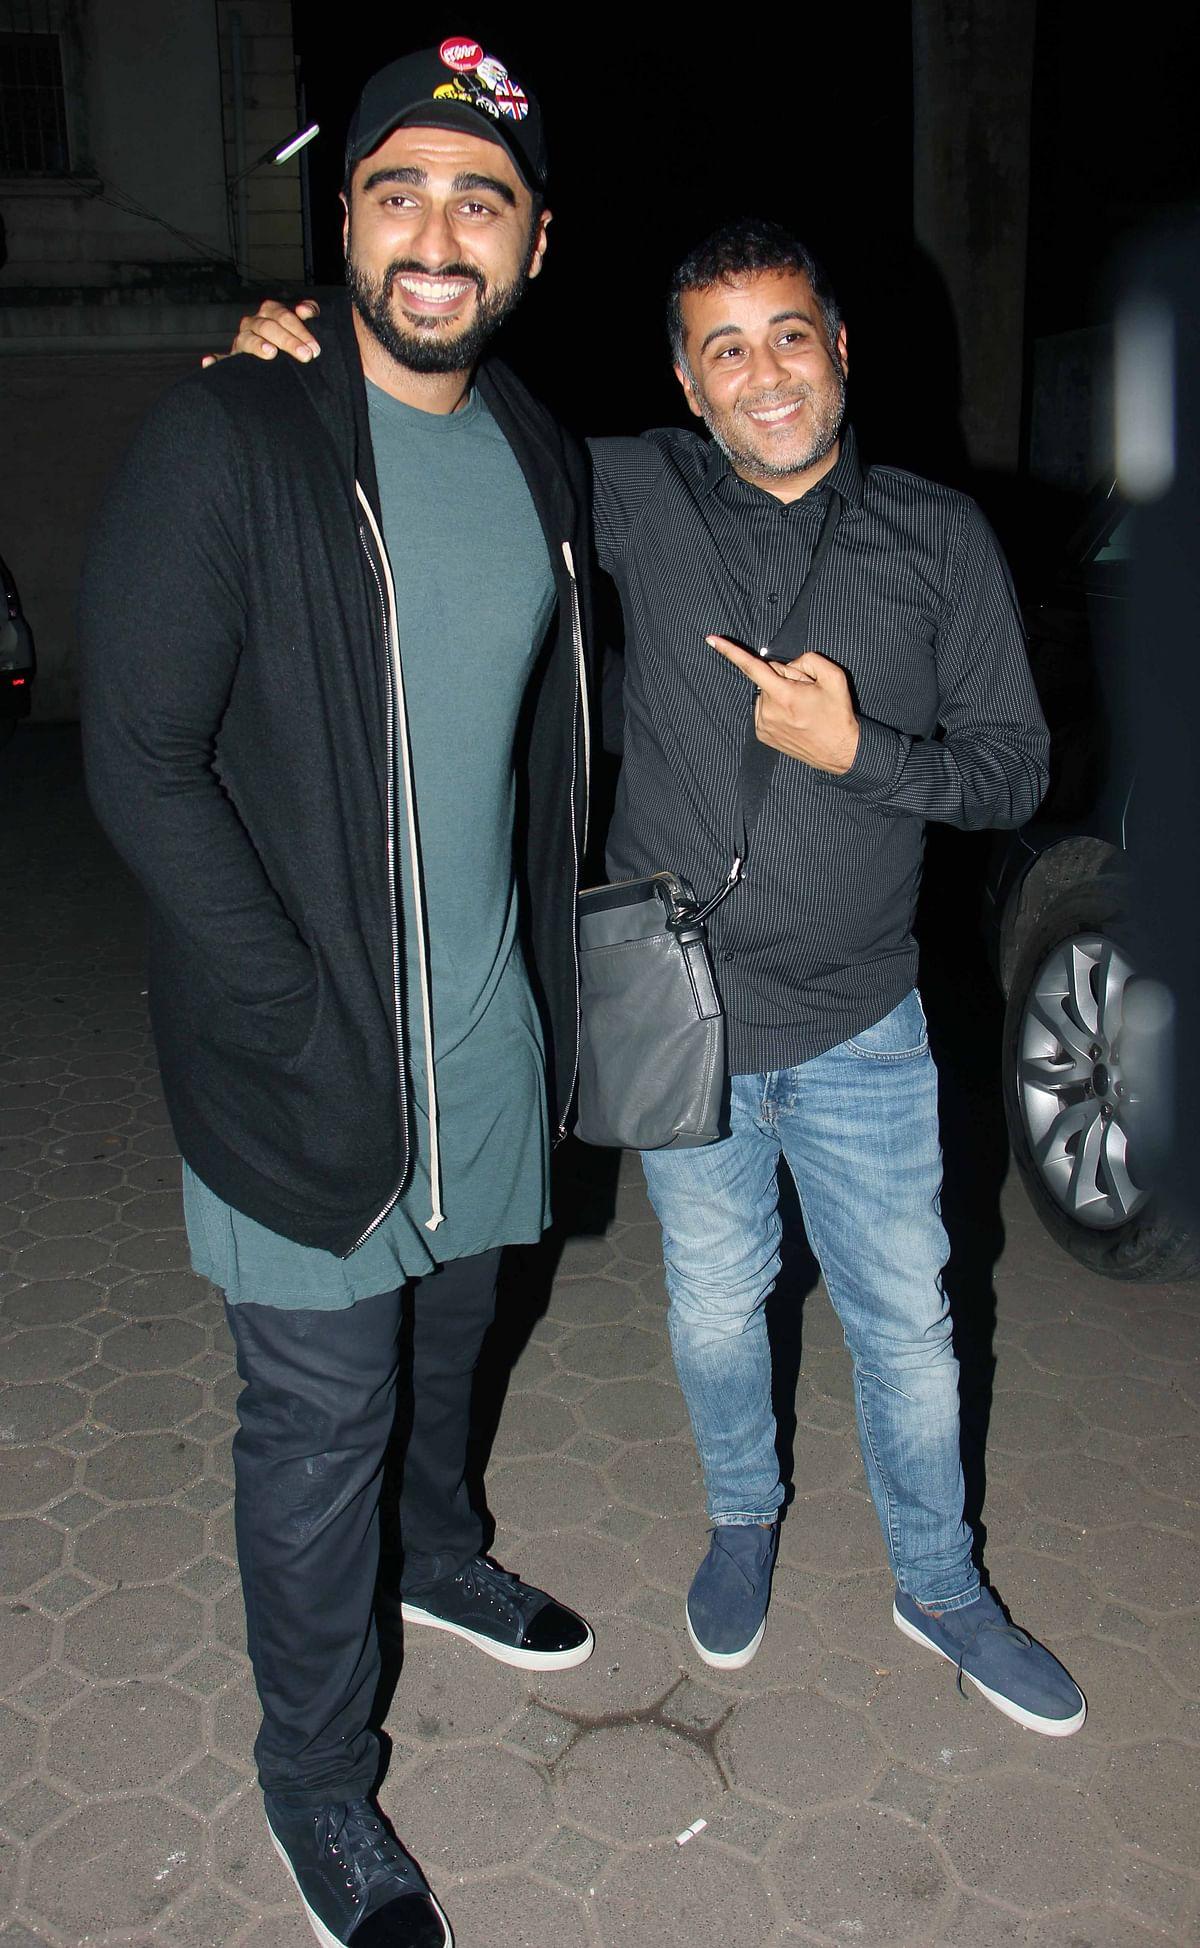 Arjun Kapoor seems amused with Chetan Bhagat, both of them are part of Mohit's new film <i>Half Girlfriend. </i>(Photo: Yogen Shah)